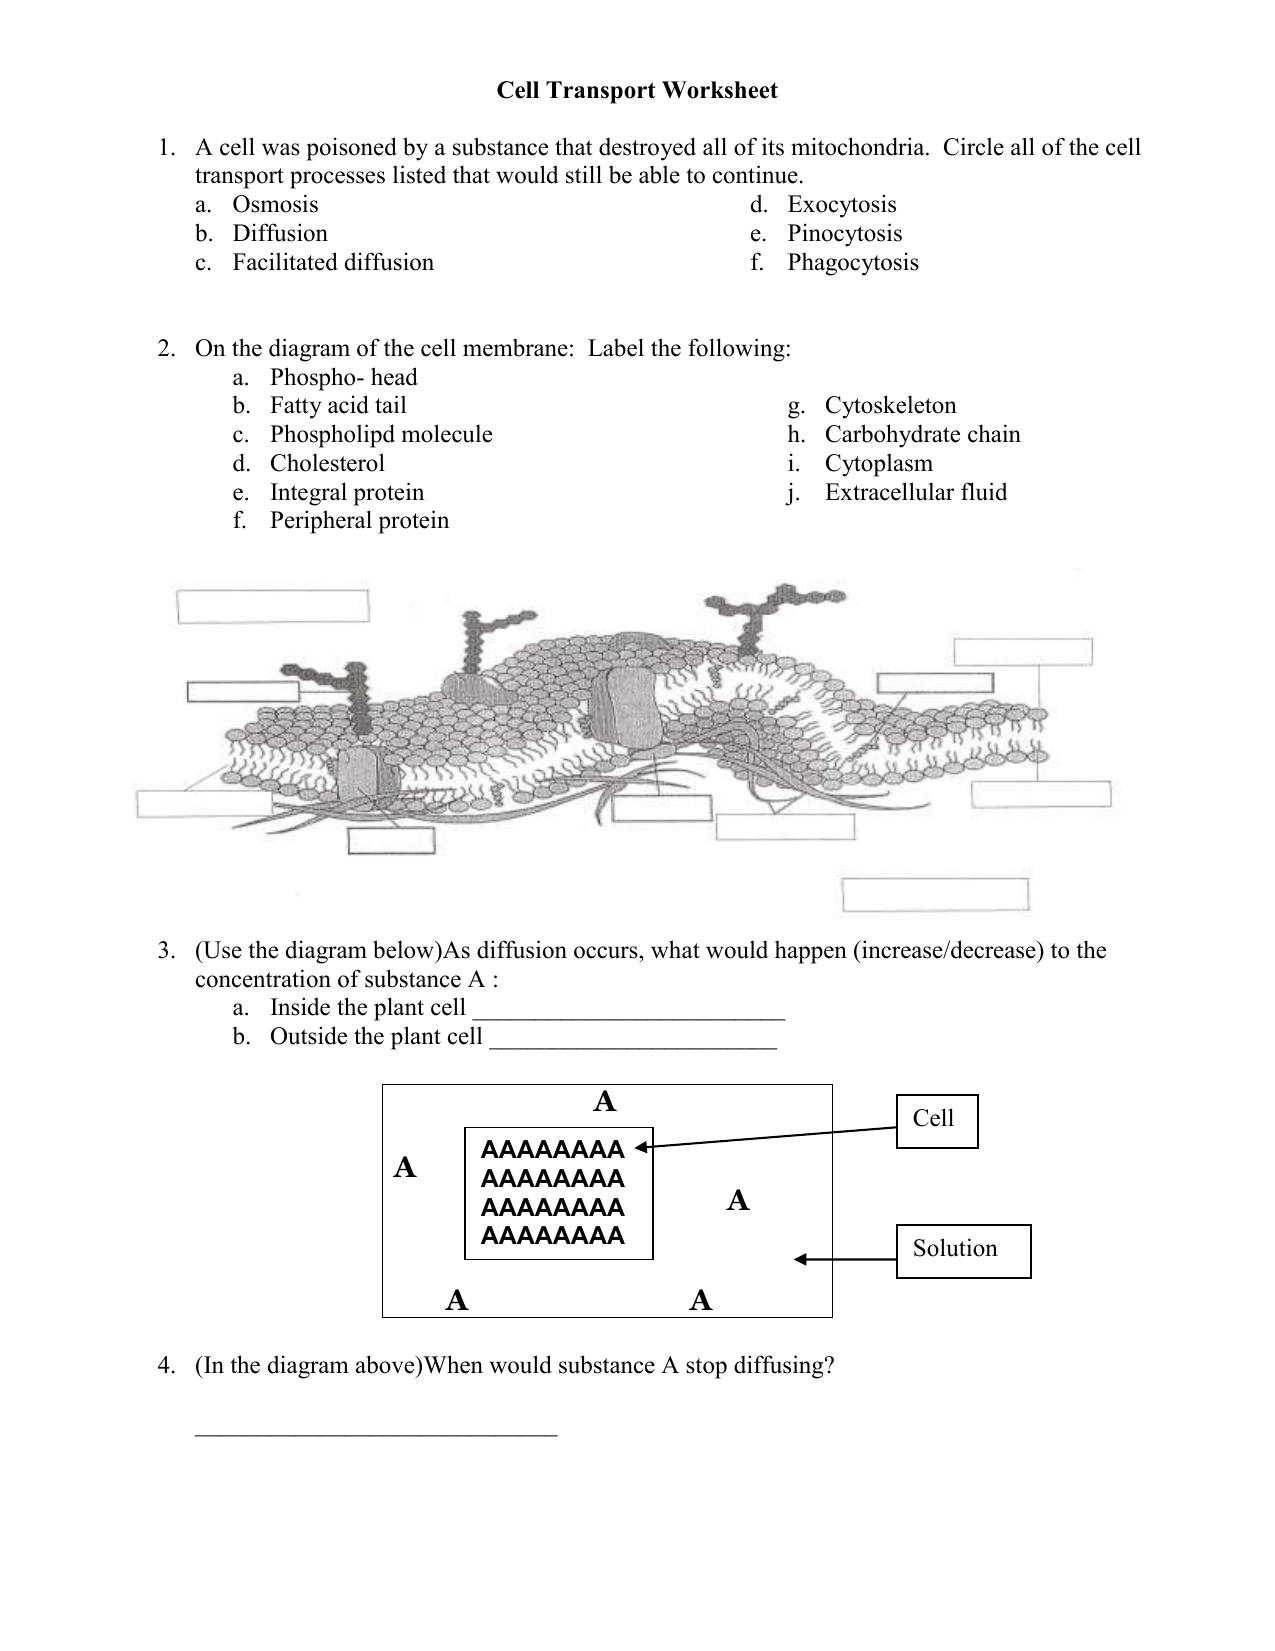 Pre ap biology cell transport worksheet ccuart Gallery